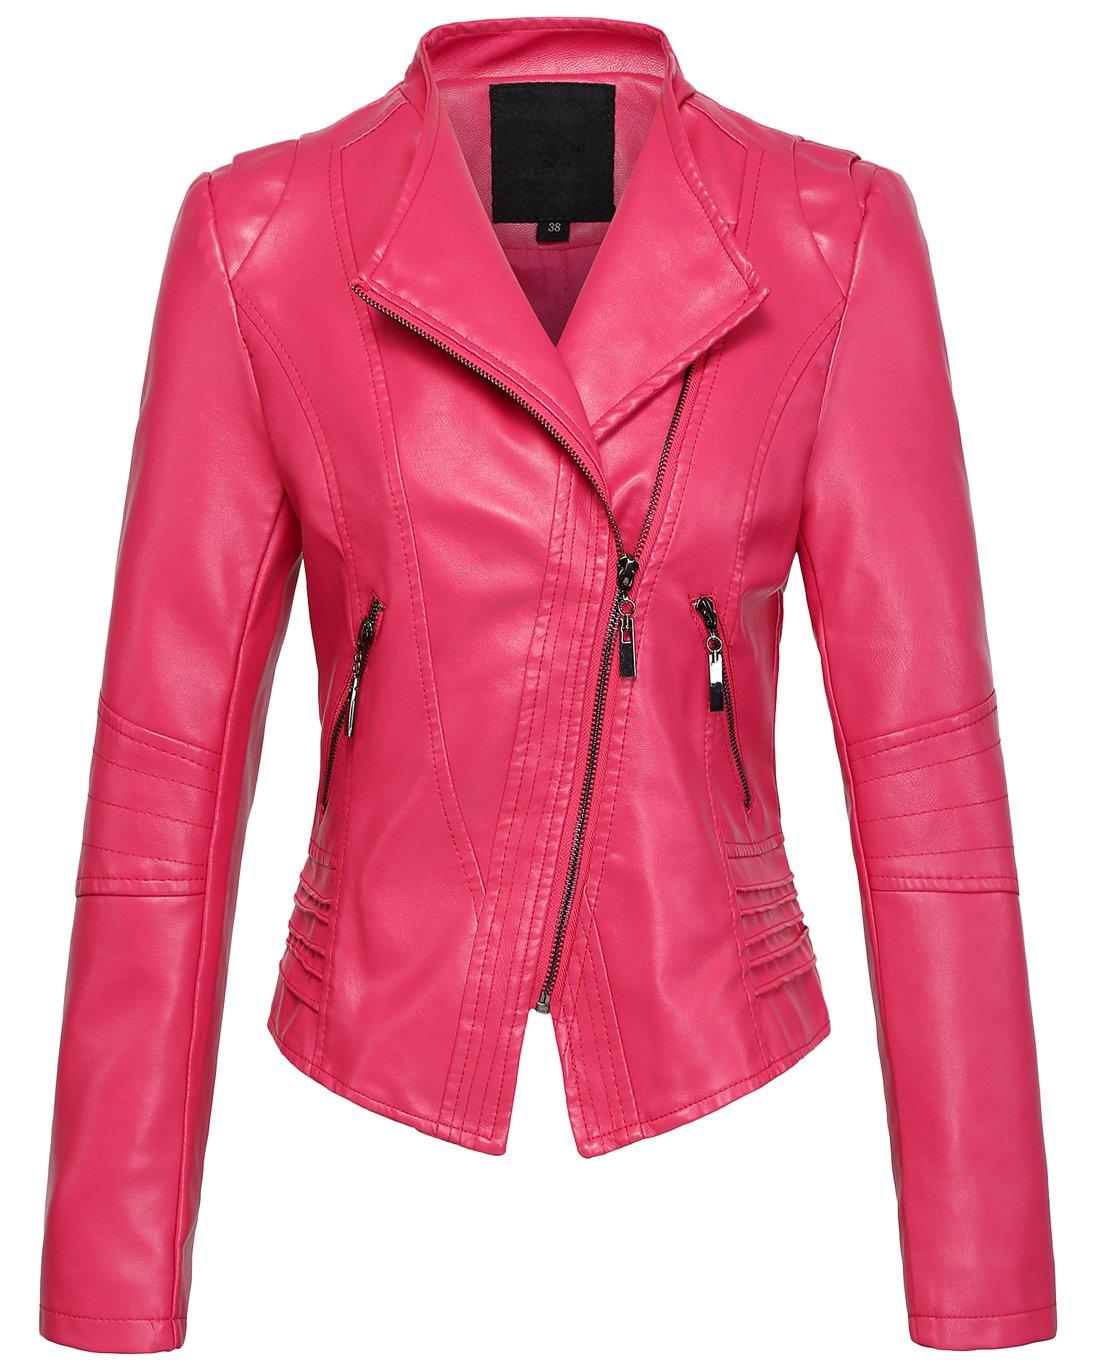 chouyatou Women's Casual Collarless Cropped Pu Leather Biker Jacket (Large, Rose) by chouyatou